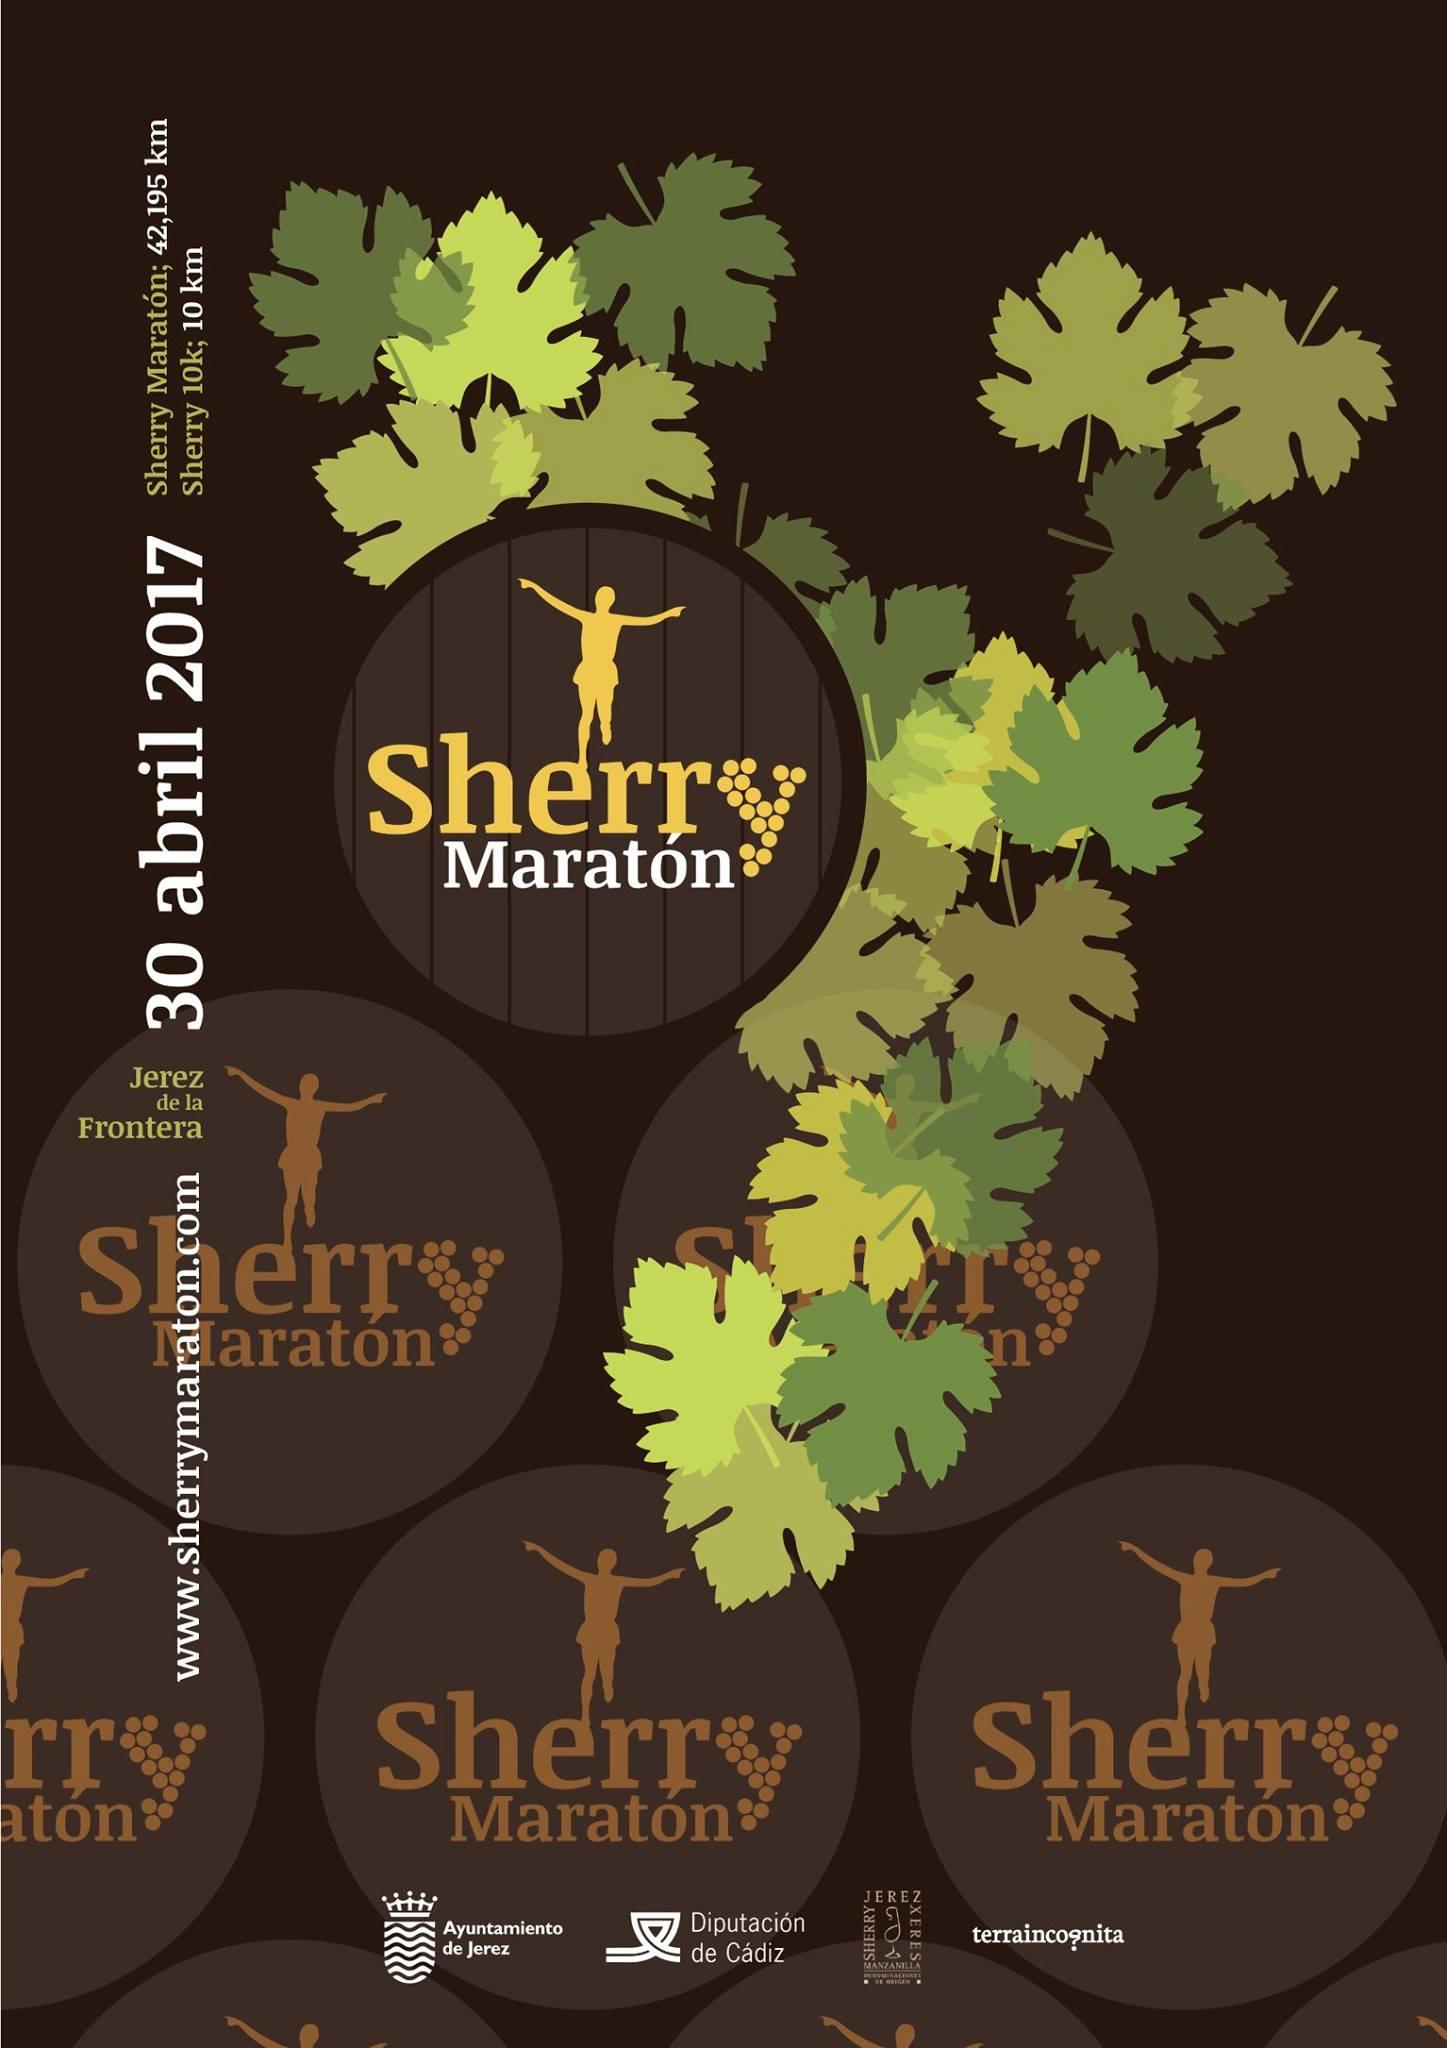 2017_Sherry maraton (2)